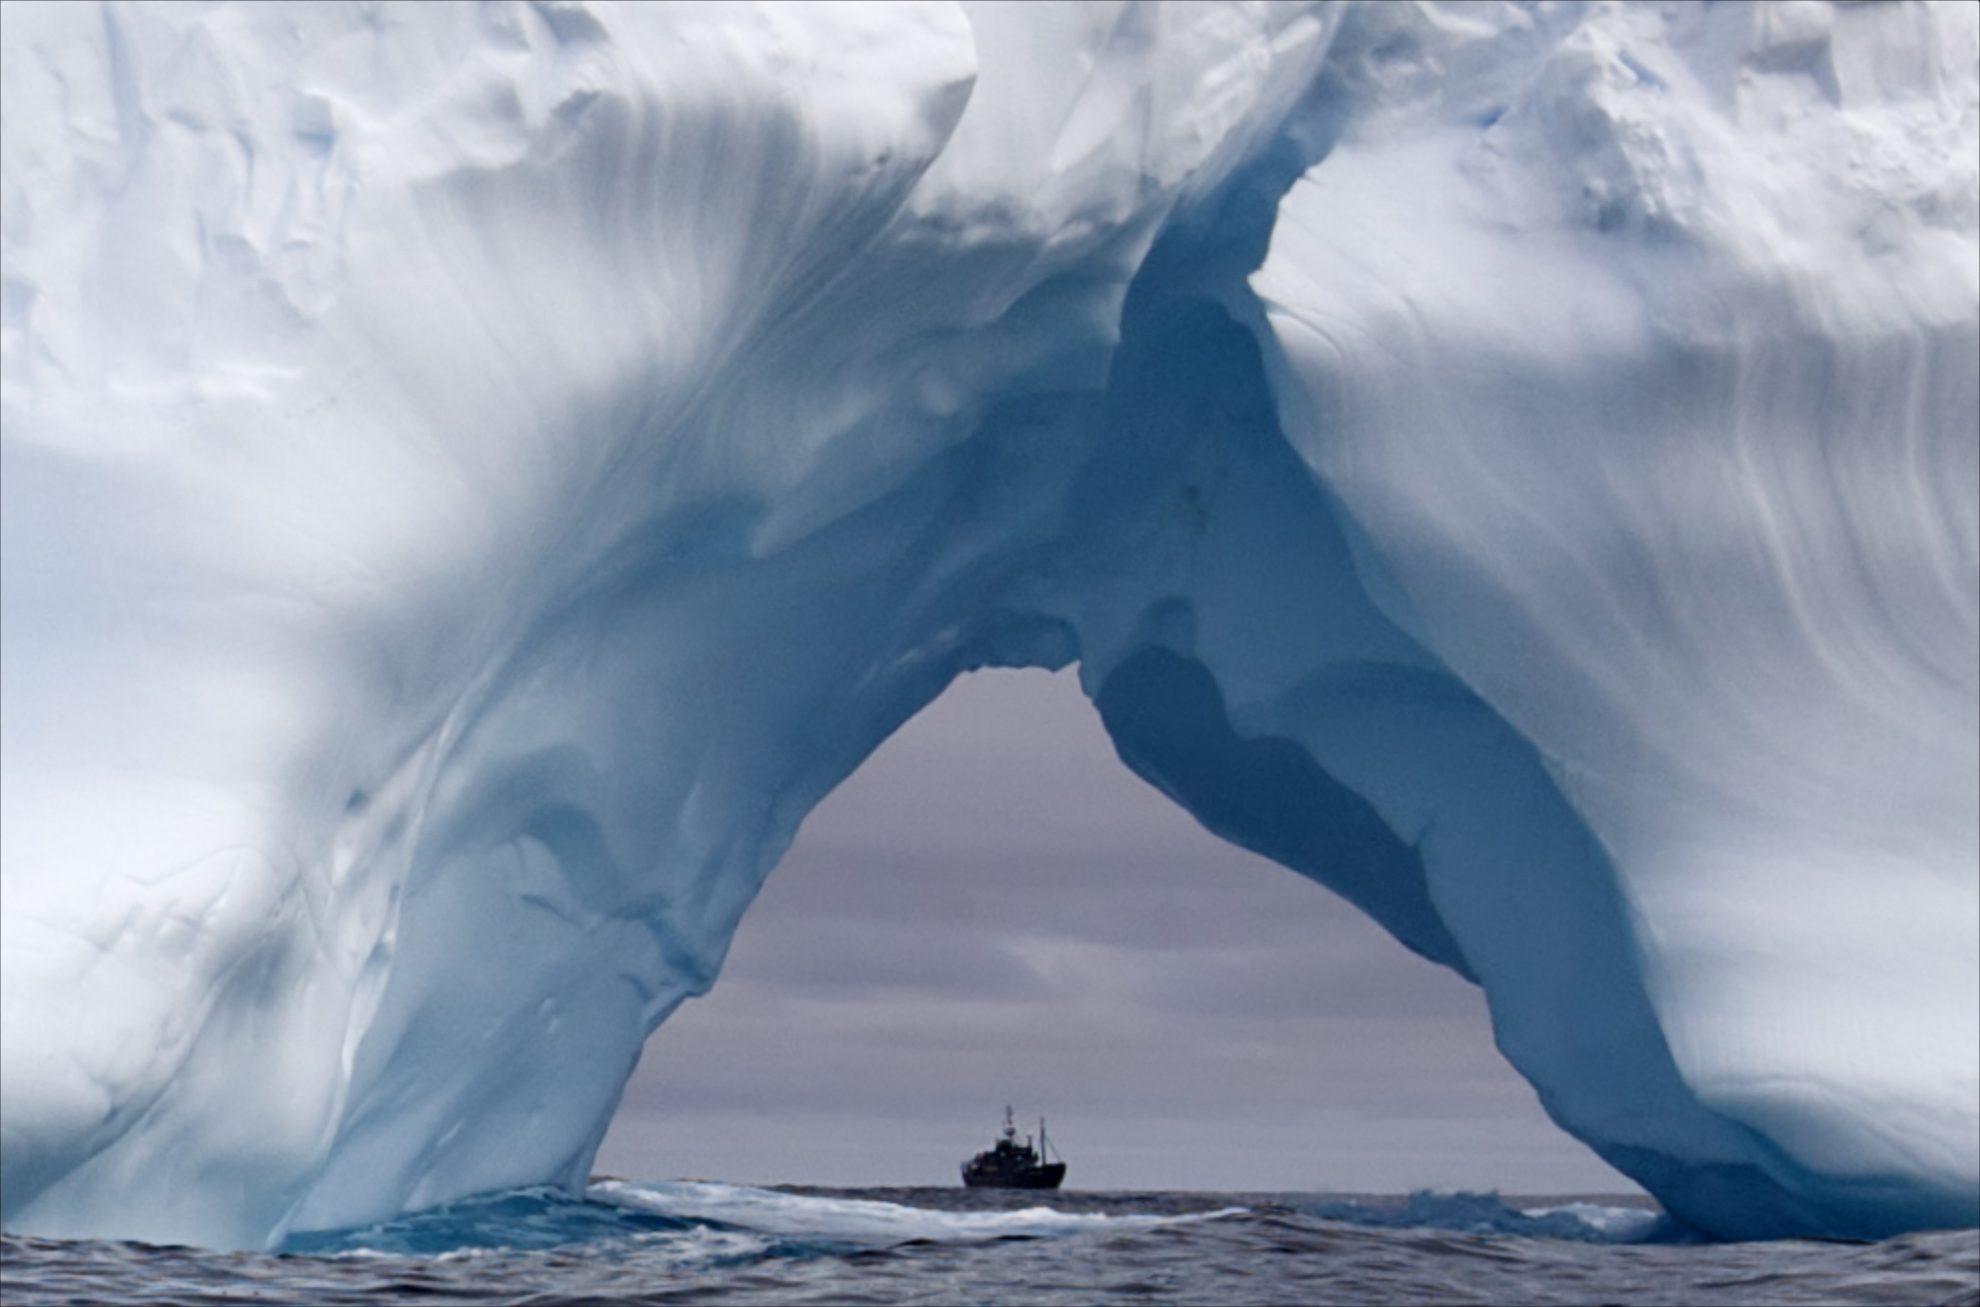 Айсберг в океане. Фотограф  Steve Irwin